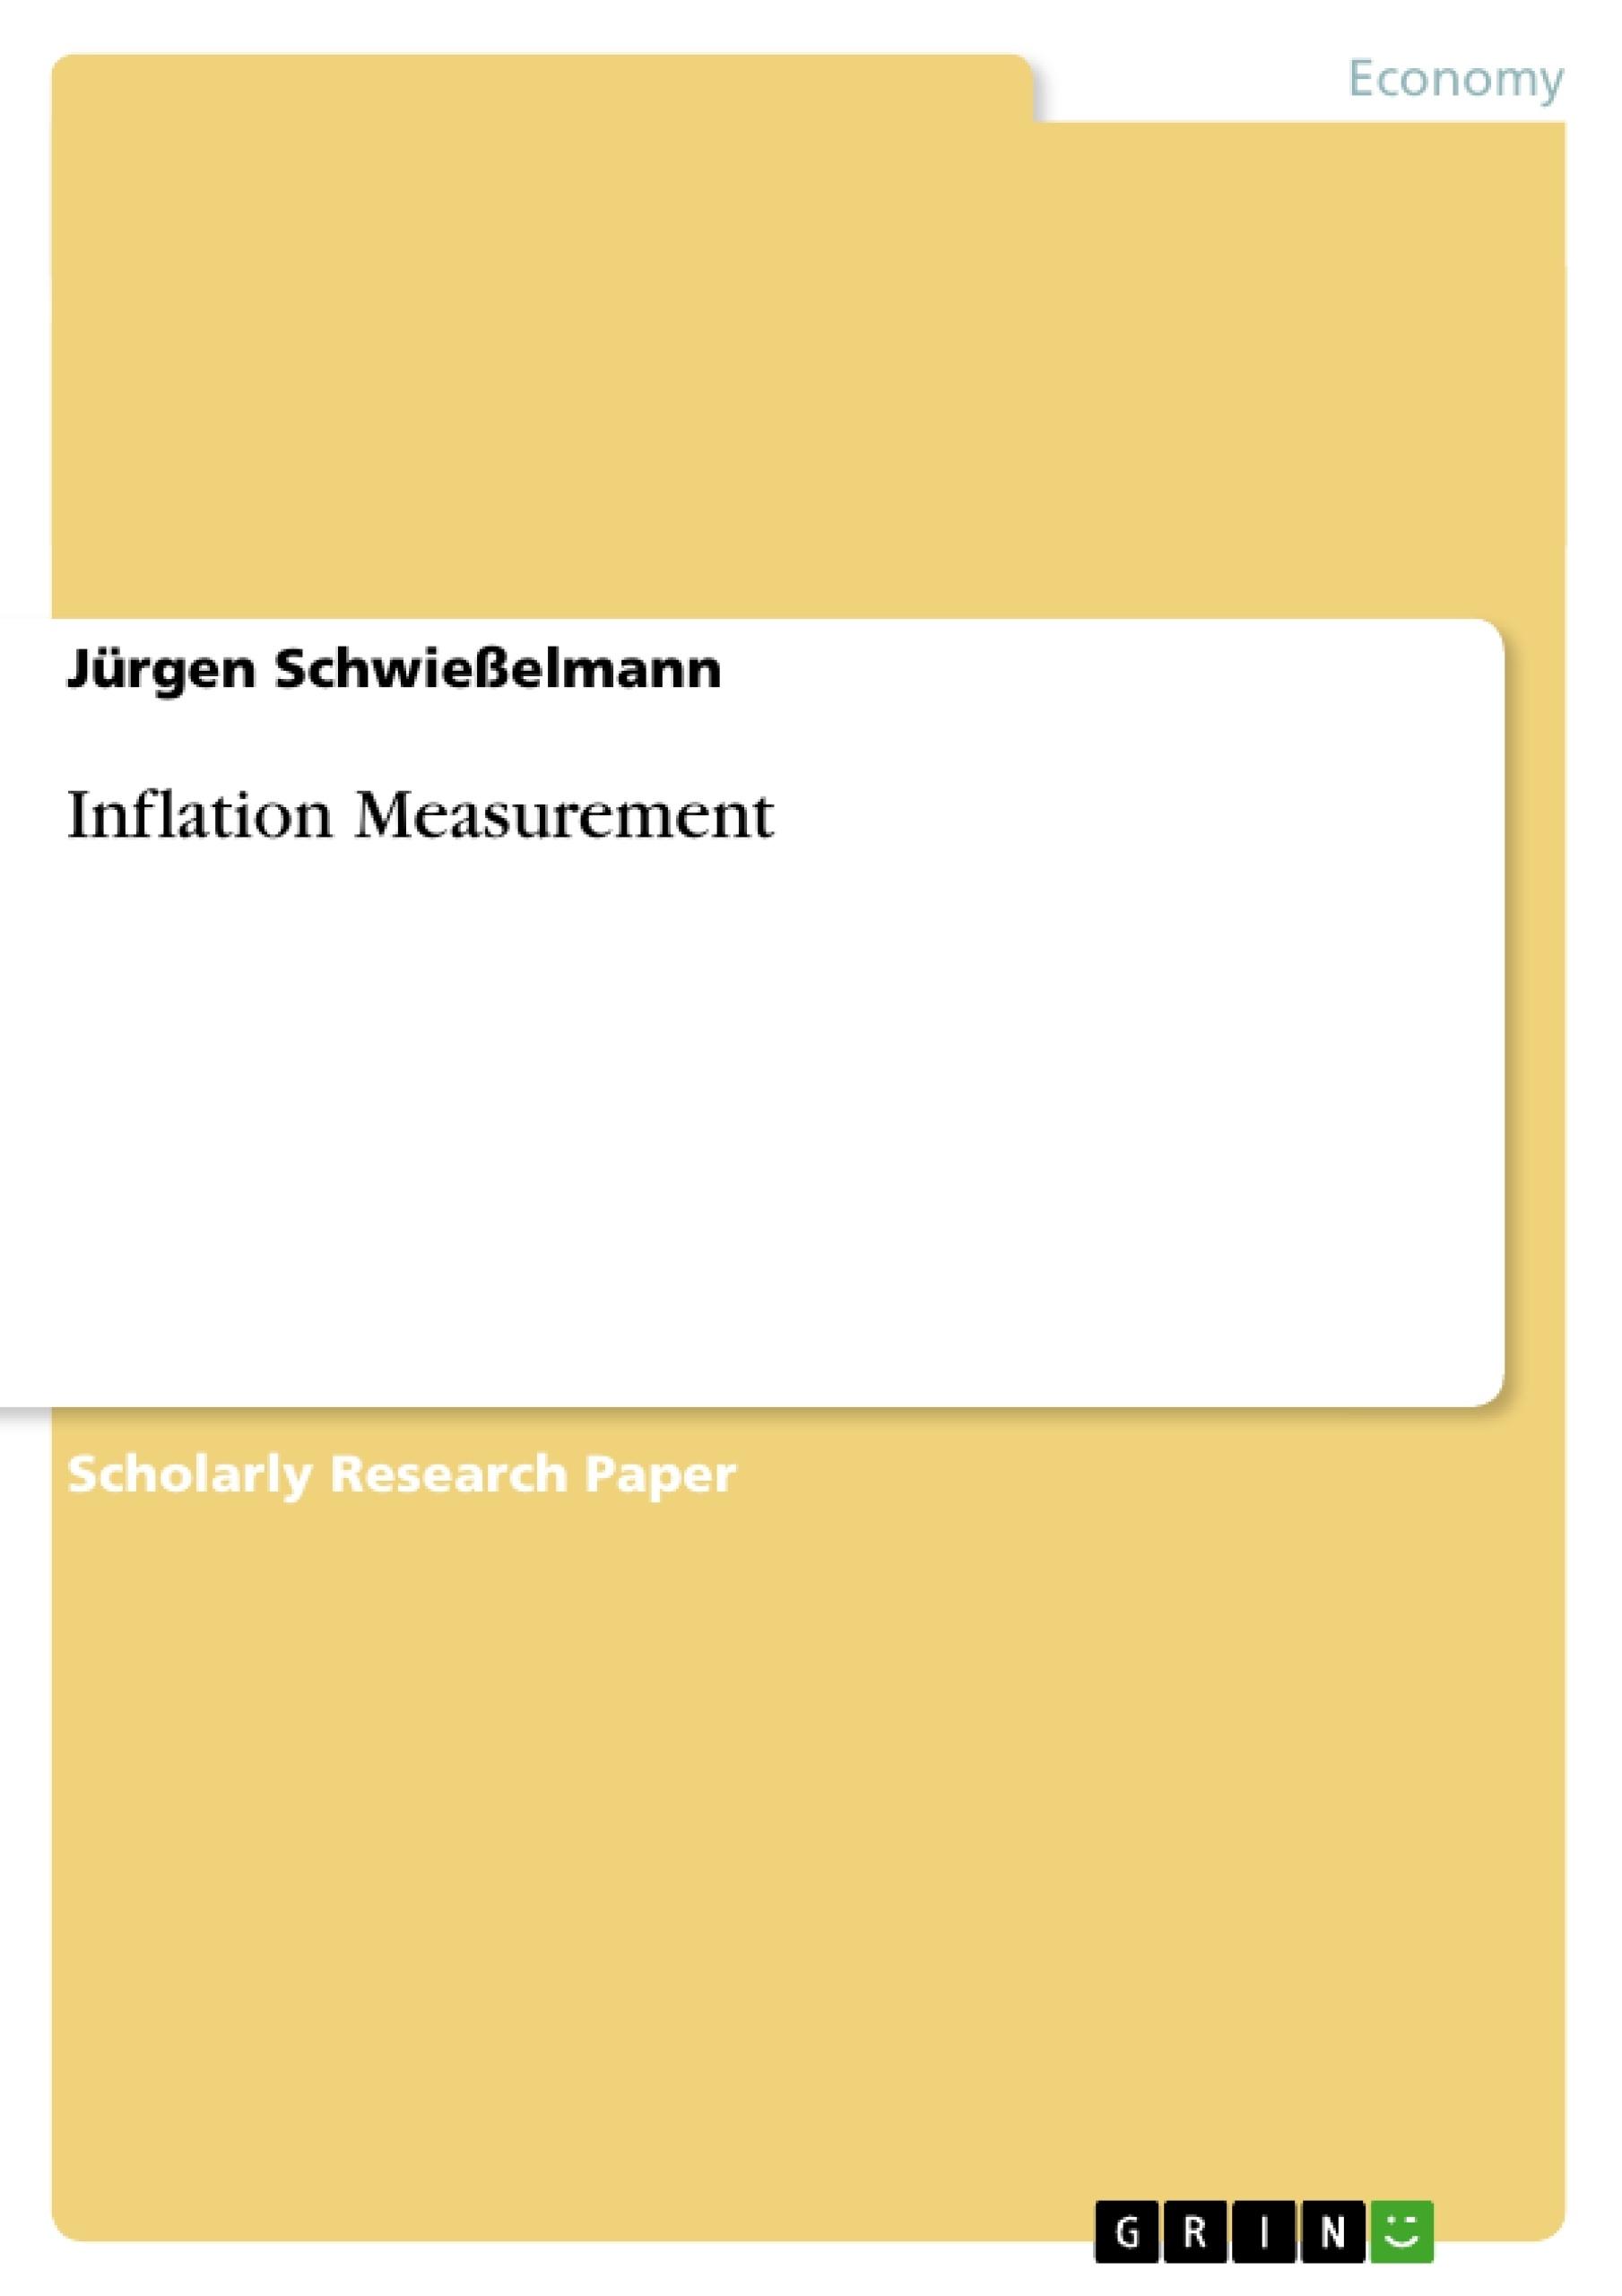 Title: Inflation Measurement